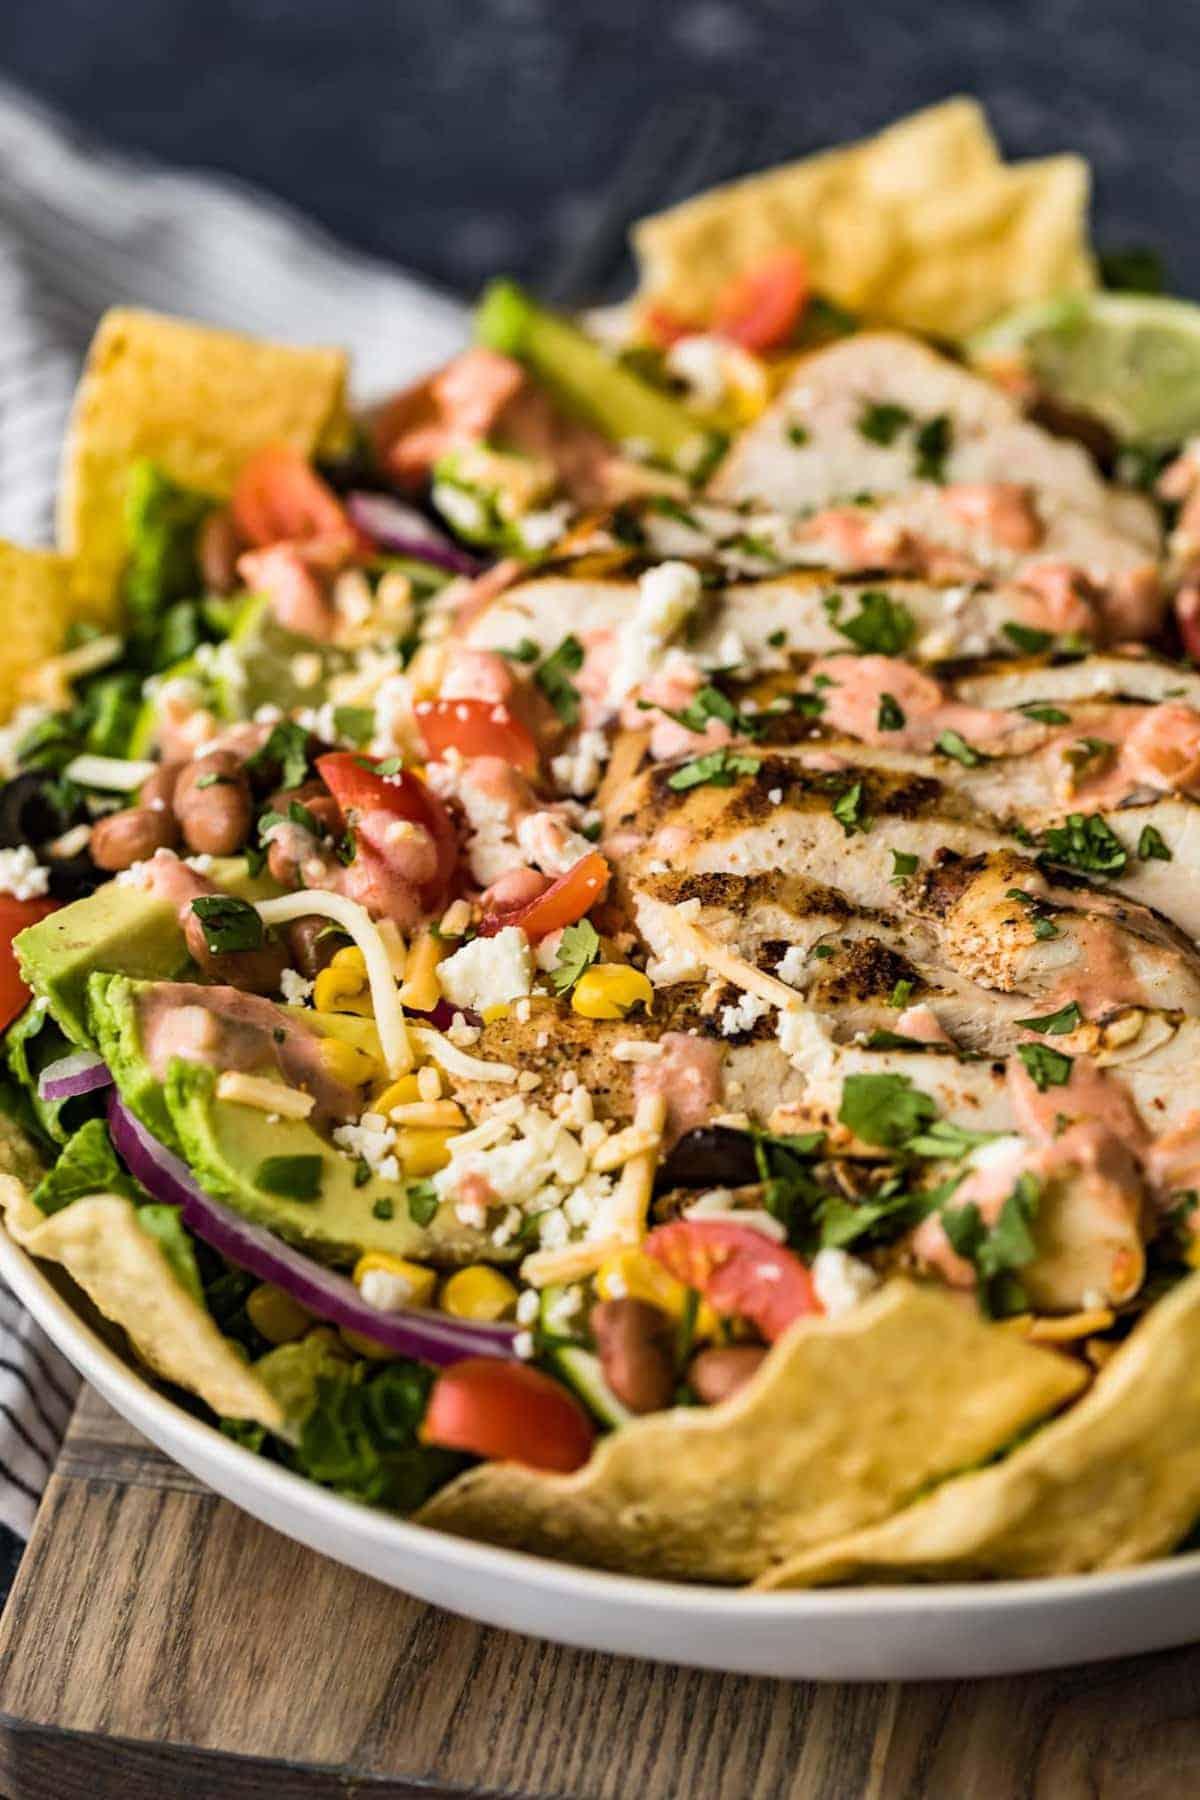 Chicken Taco Salad ready to serve